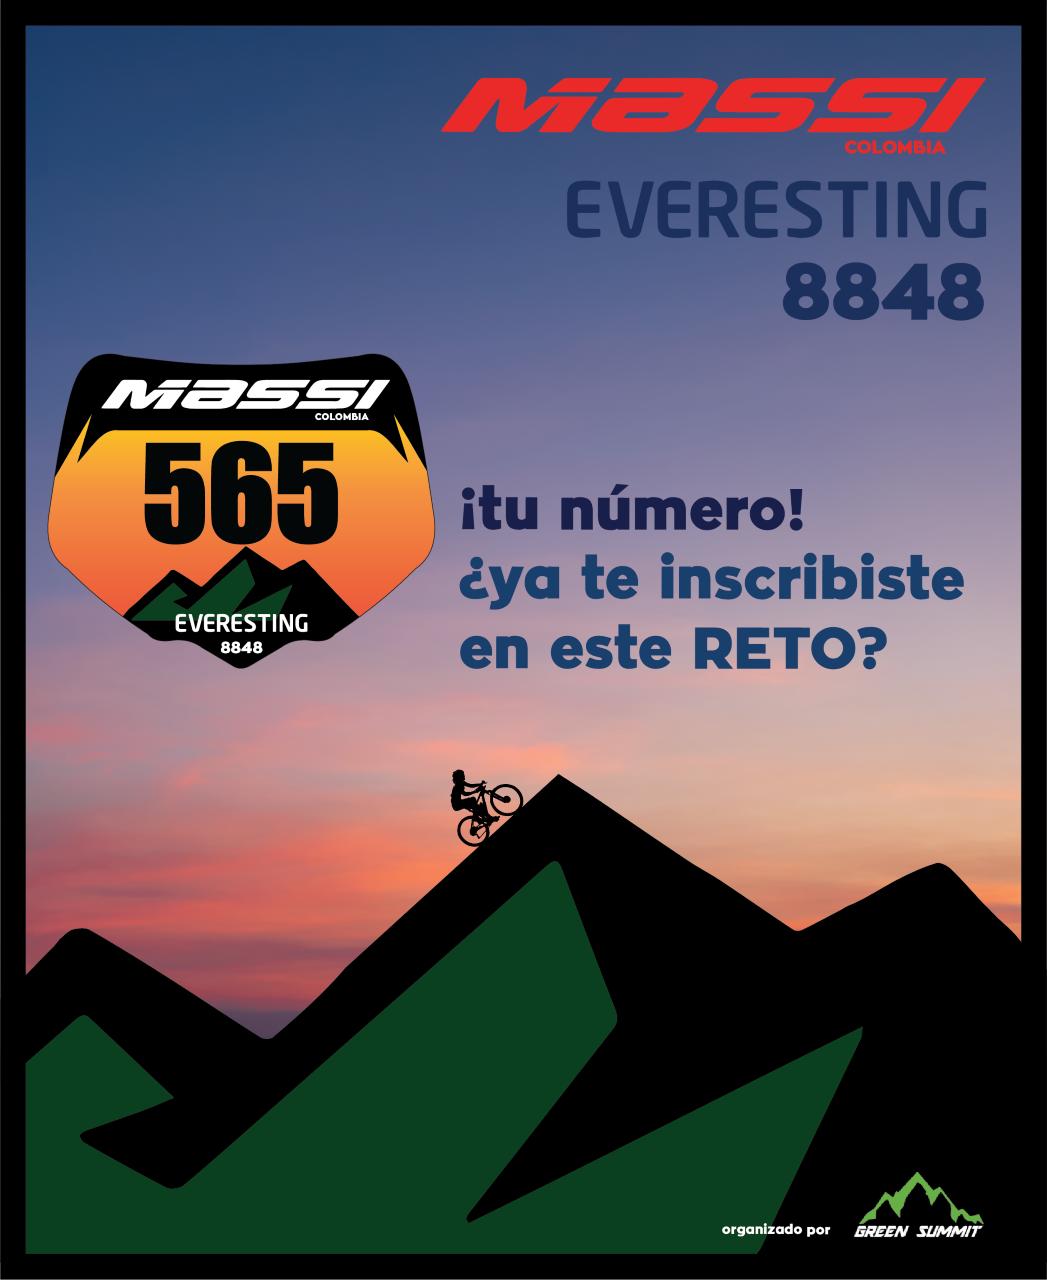 Thumbnail 6 everesting post massi colombia everesting  pieza campan%cc%83a 3